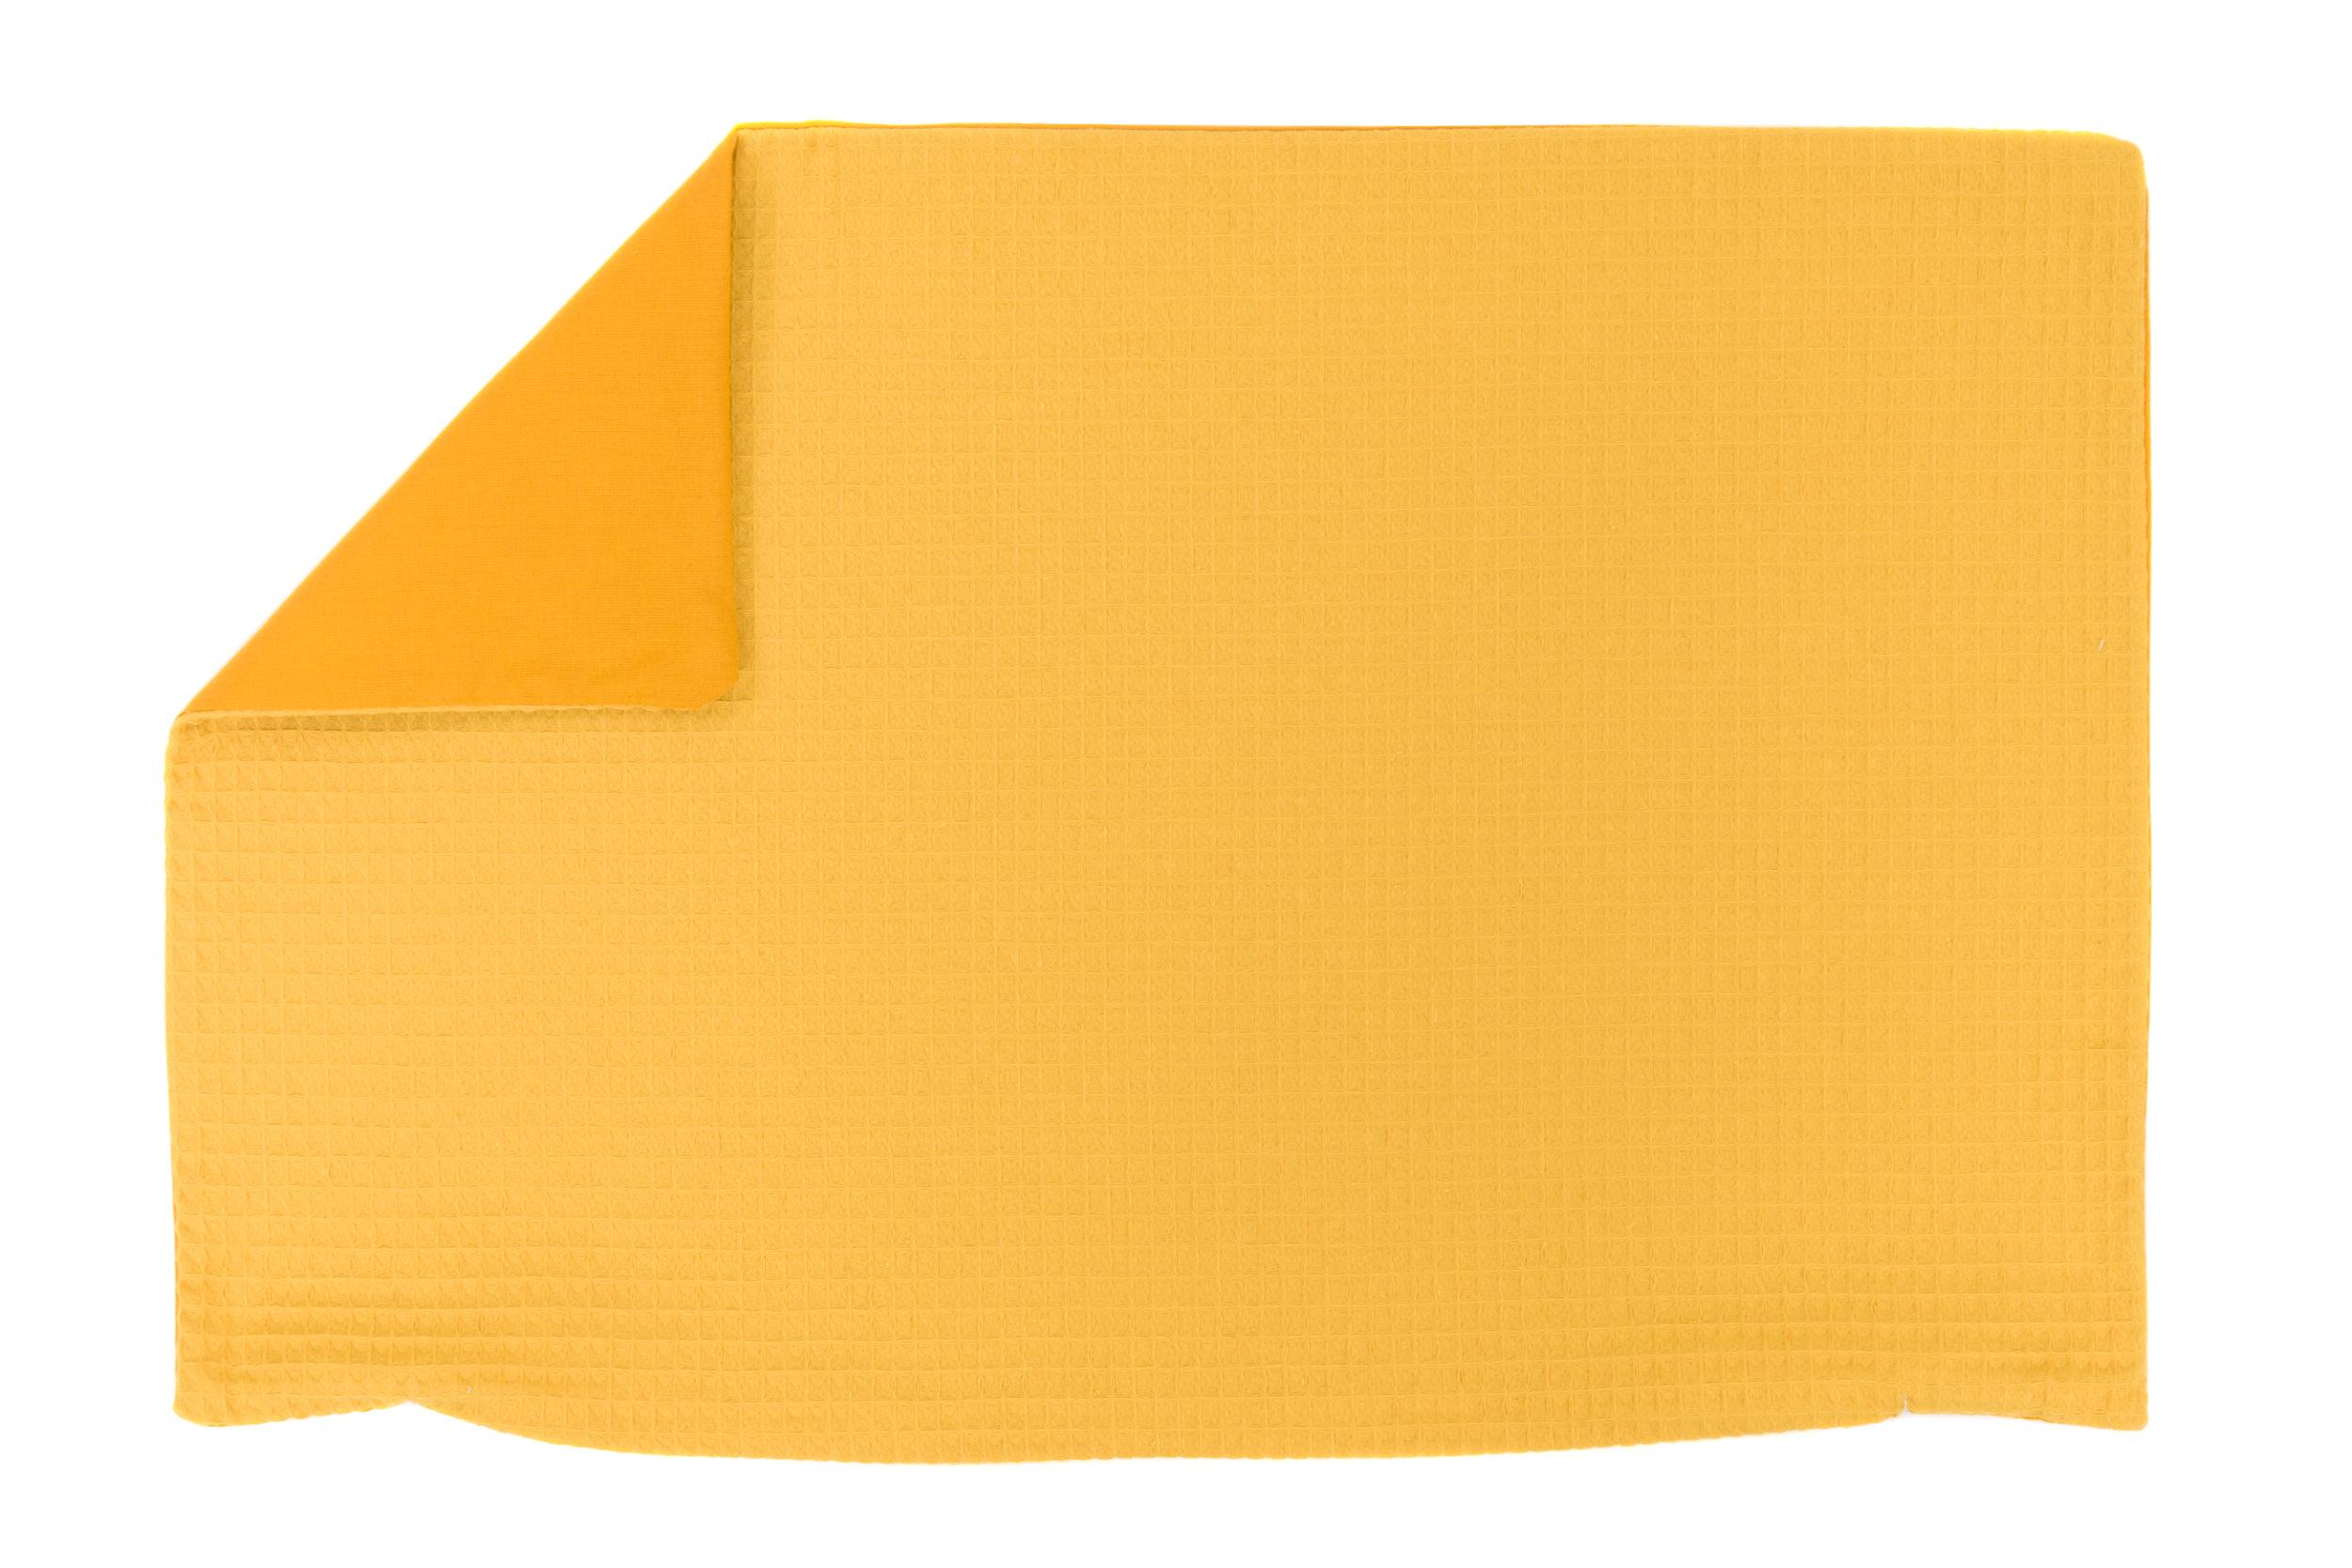 Kissenhülle Zierkissenbezug Kissenbezug ca. 60x40 cm für Kissen oder Dekokissen Gelb Senfgelb